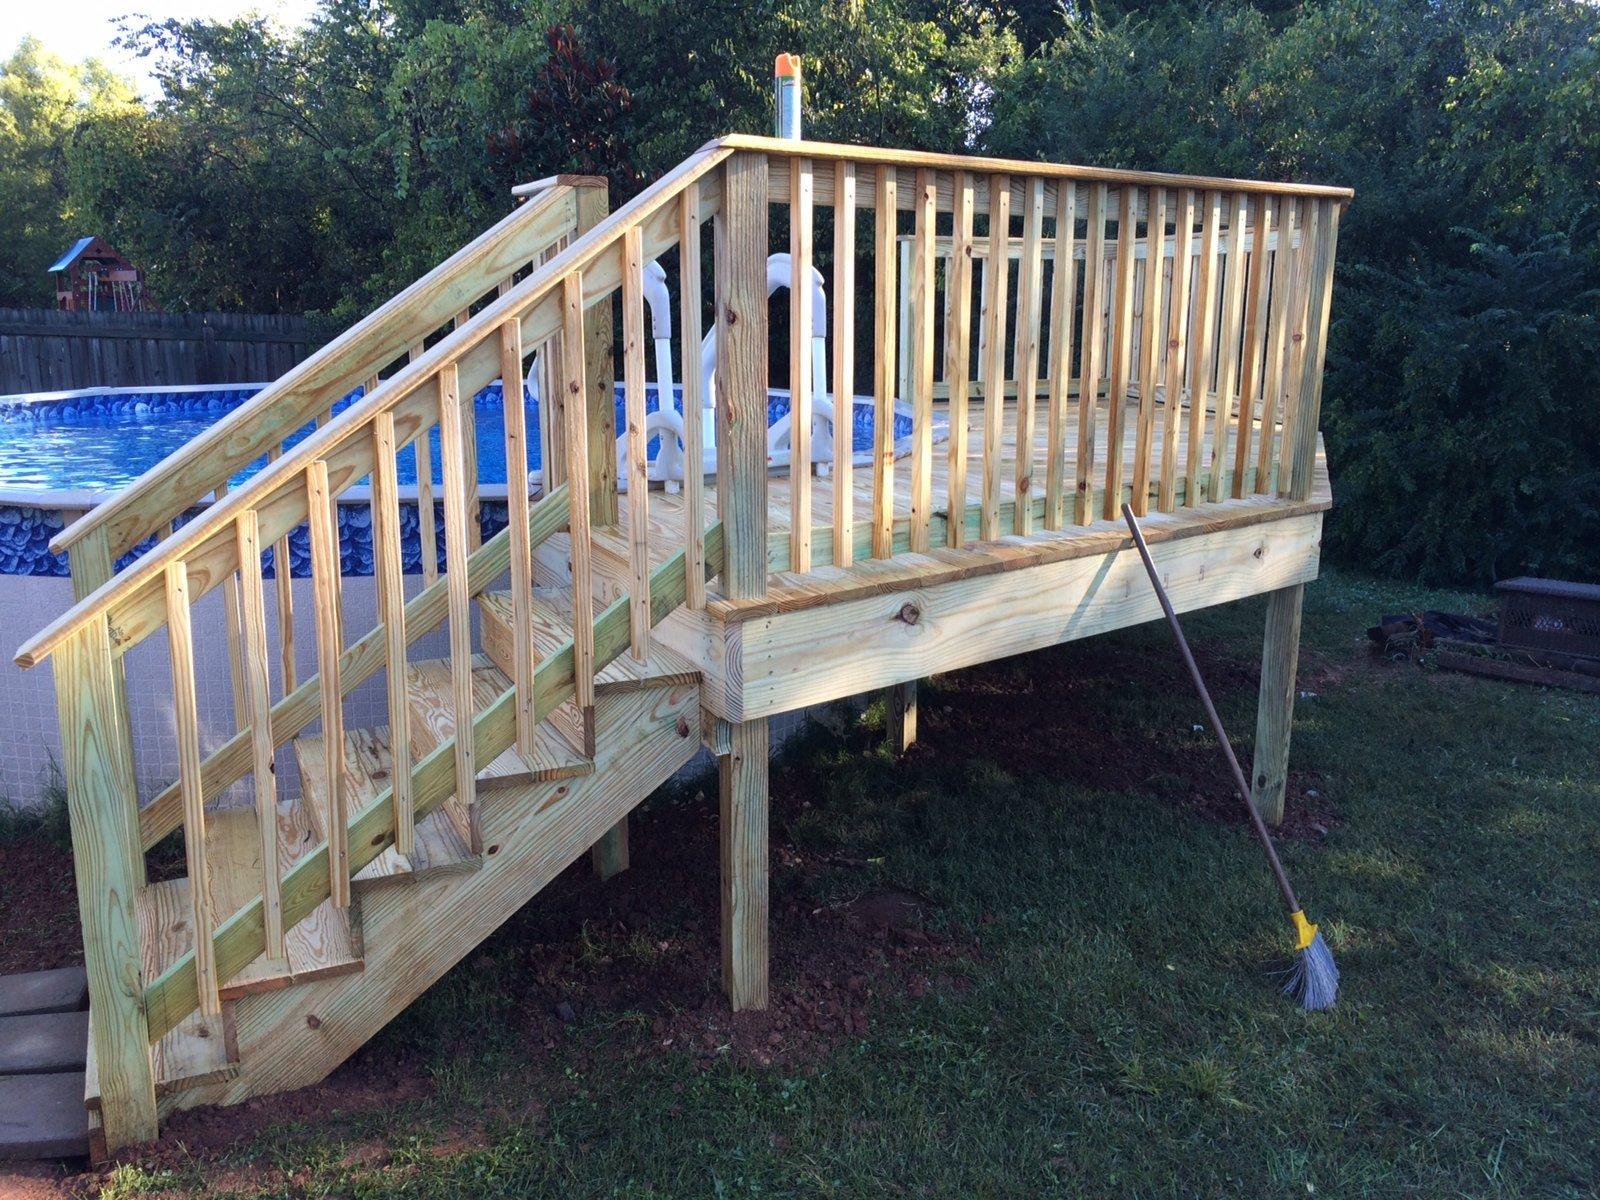 Residential Decks Commercial Decks Murfreesboro Tn